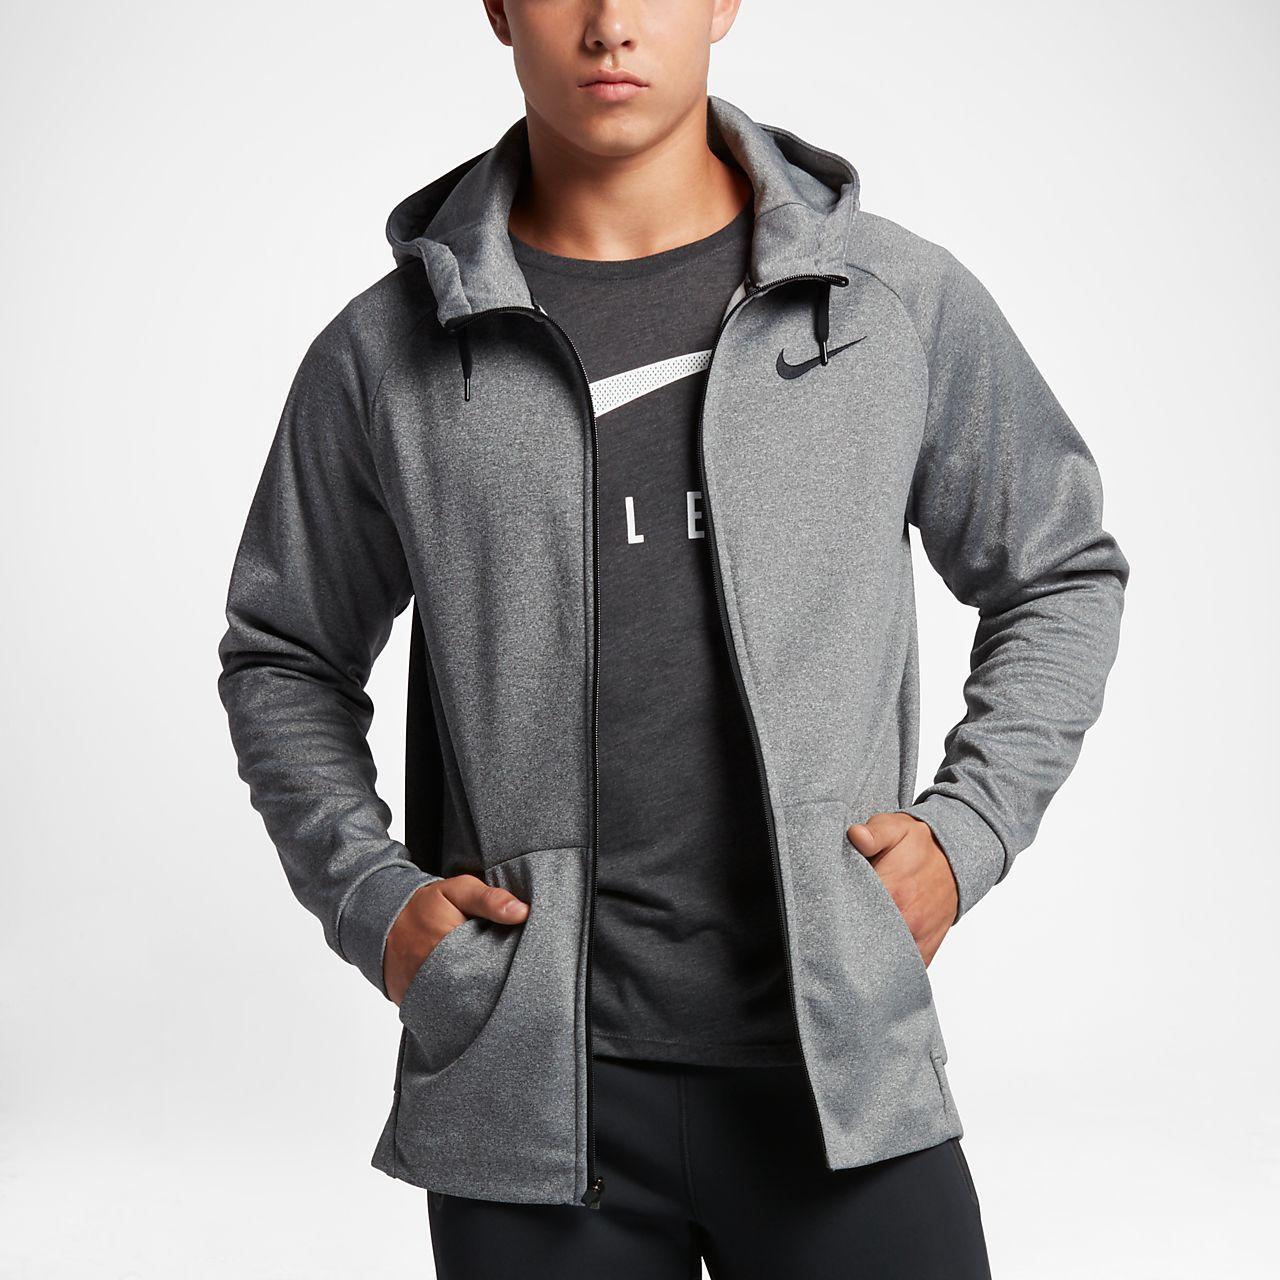 Nike Therma Men S Training Full Zip Hoodie Athletic Jacket Sweatshirt Jacket Full Zip Sweatshirt [ 1280 x 1280 Pixel ]